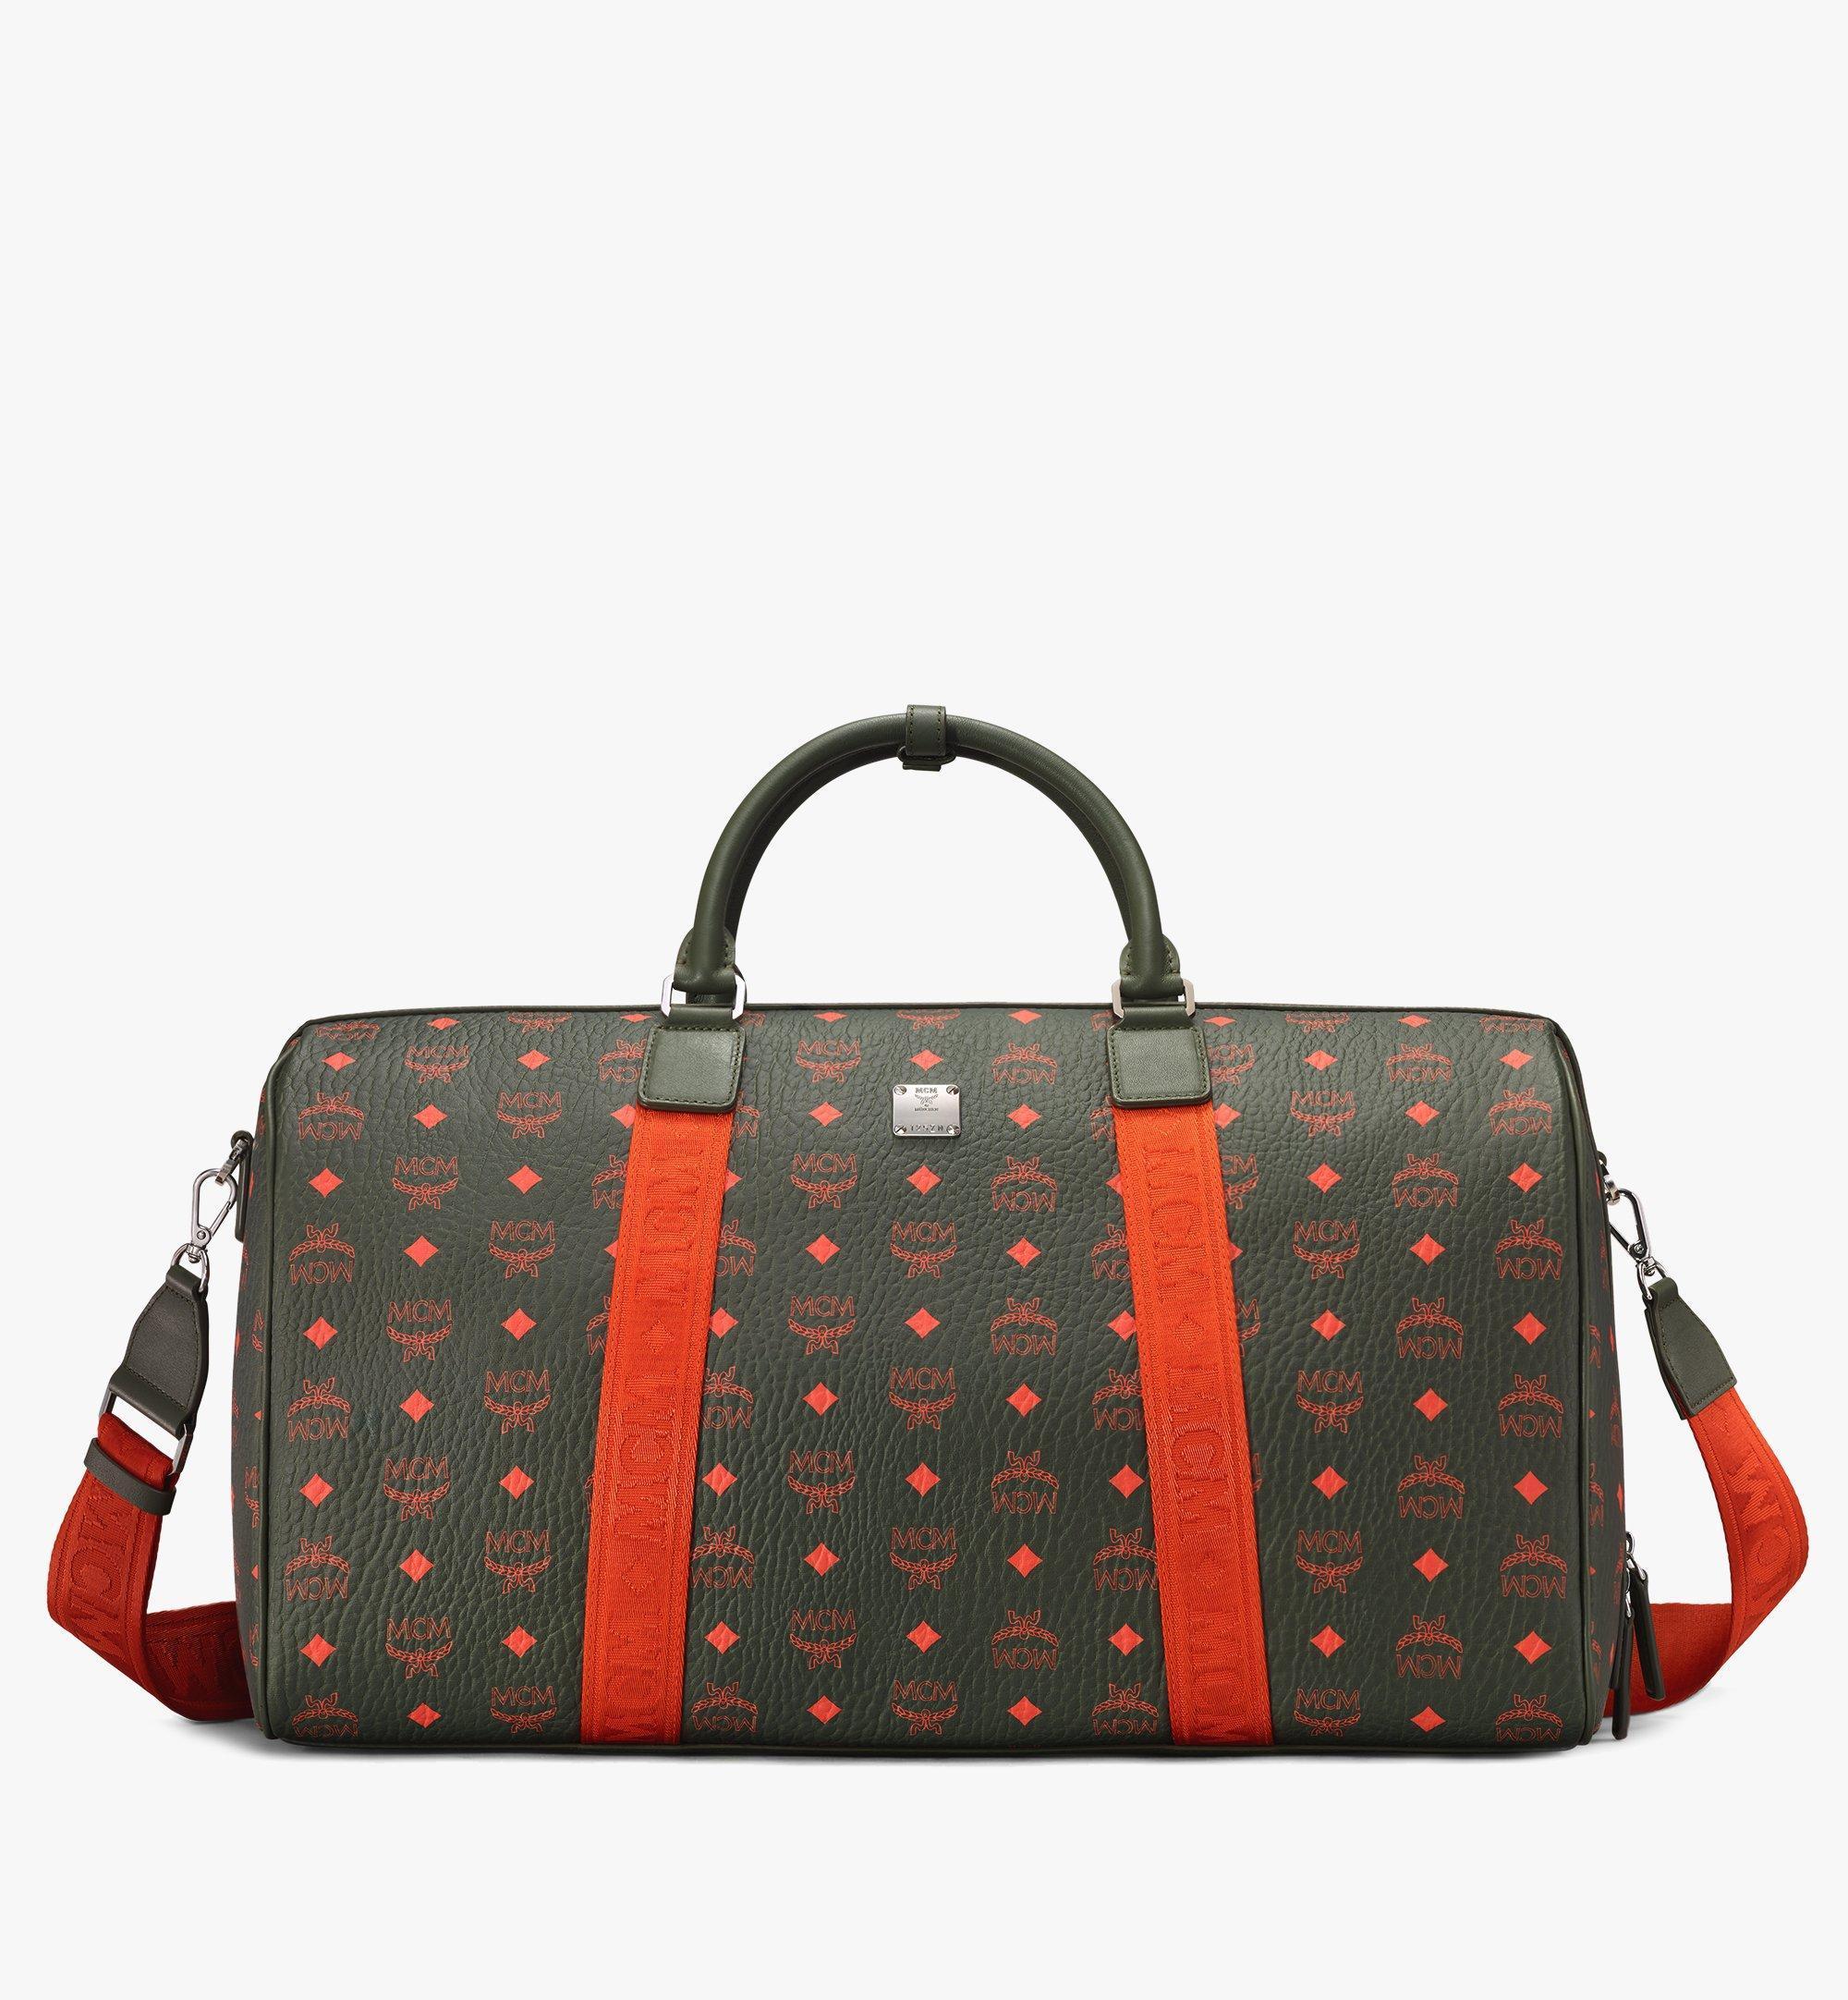 InterestPrint Pink Brown Swirly Circles Leather Tote Bag Large